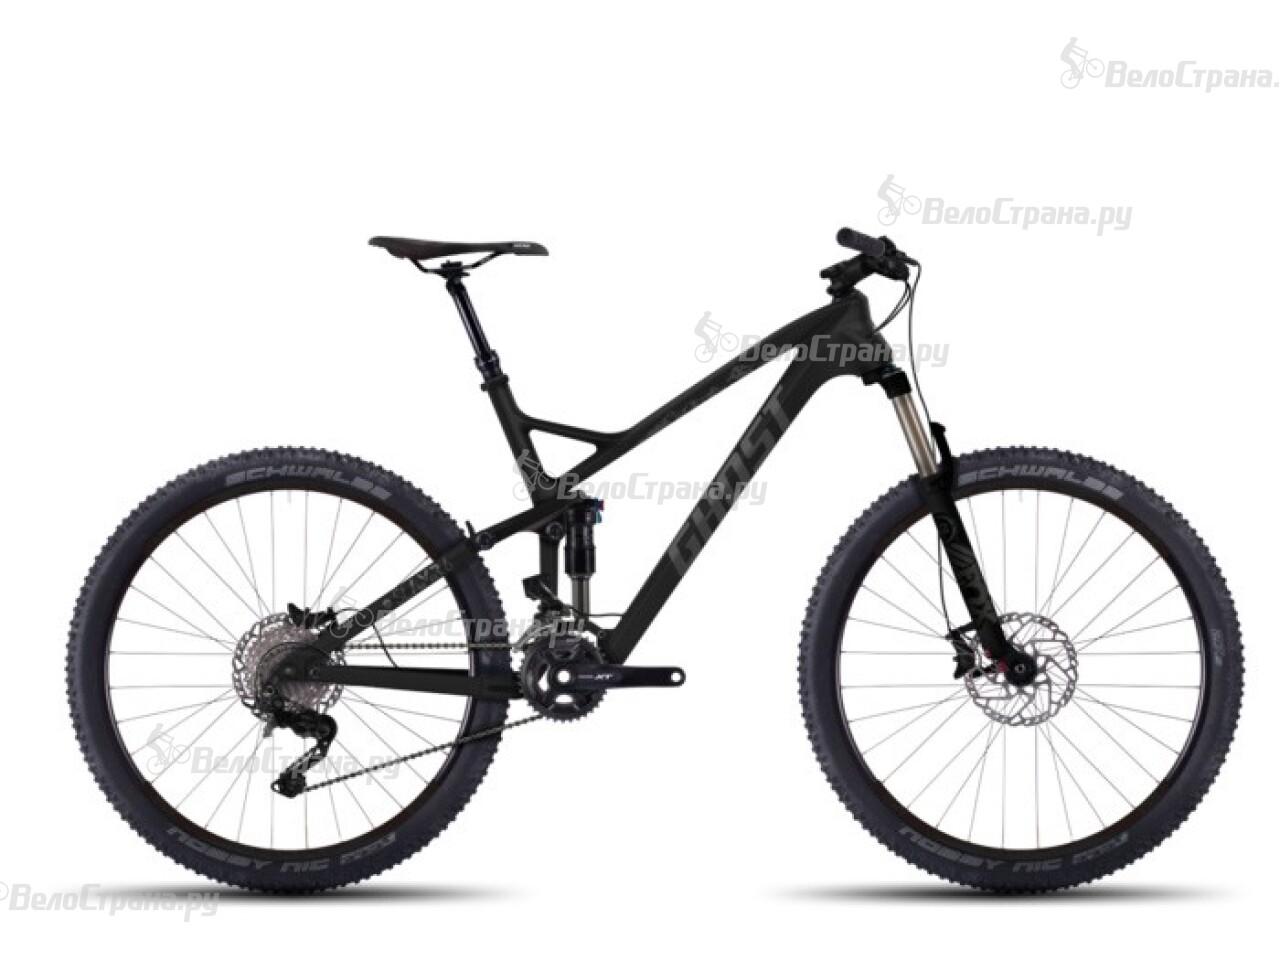 Велосипед Ghost SL AMR LC 6 (2016) велосипед ghost amr 4 2016